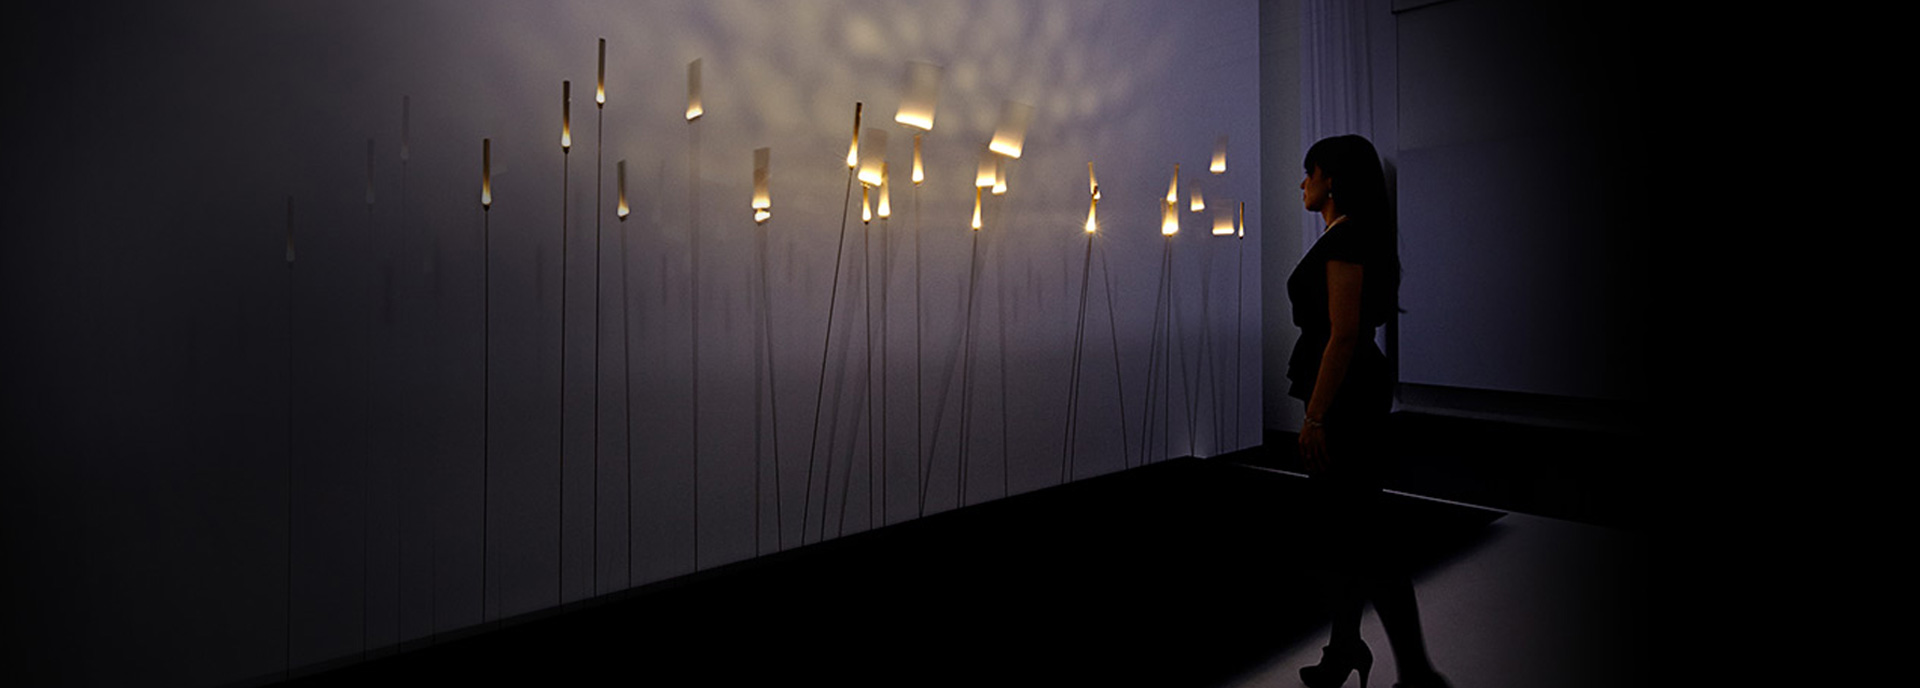 Diseno lexus lamparas